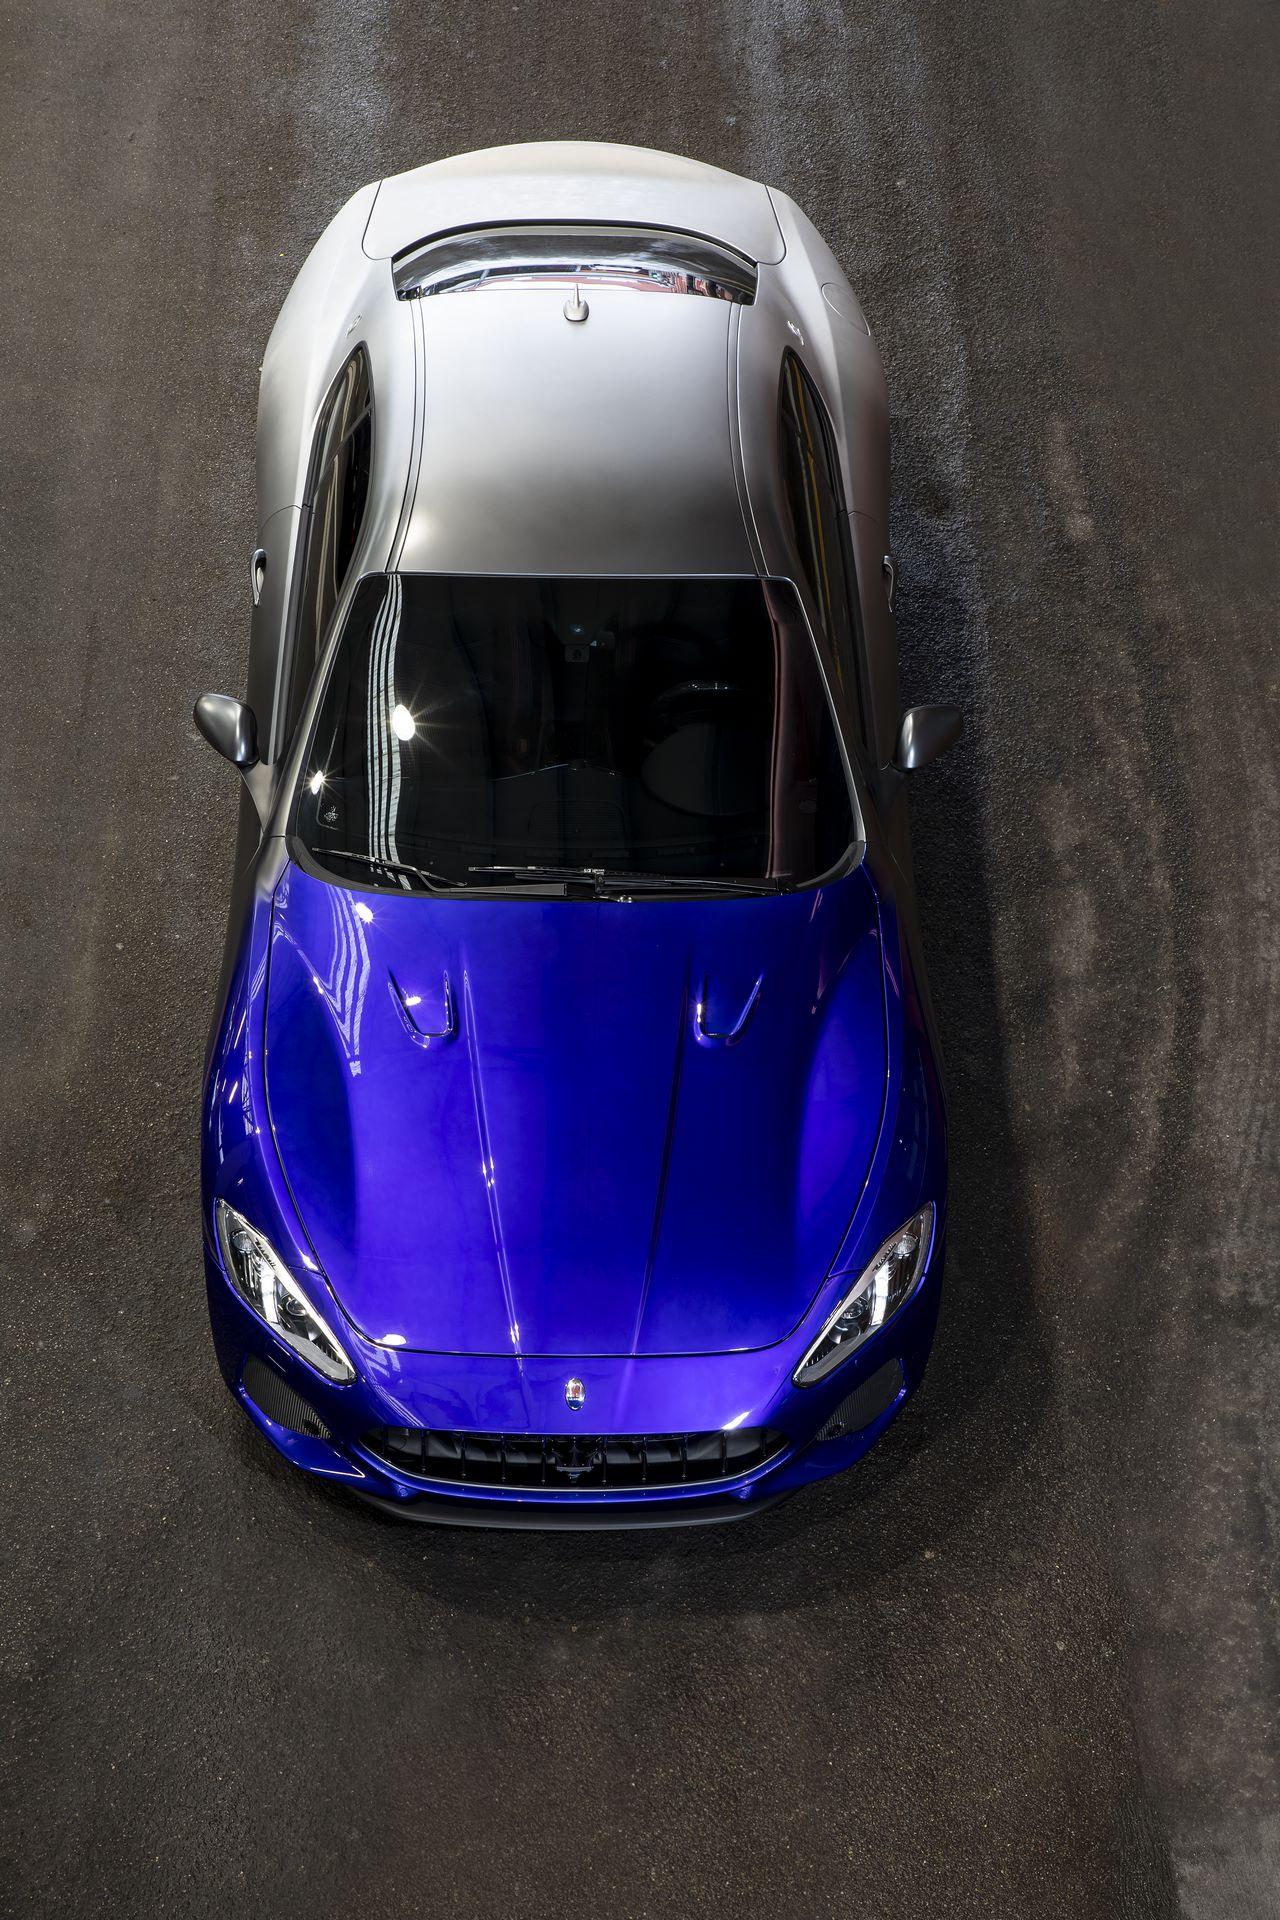 Maserati-GranTurismo-Zeda-5